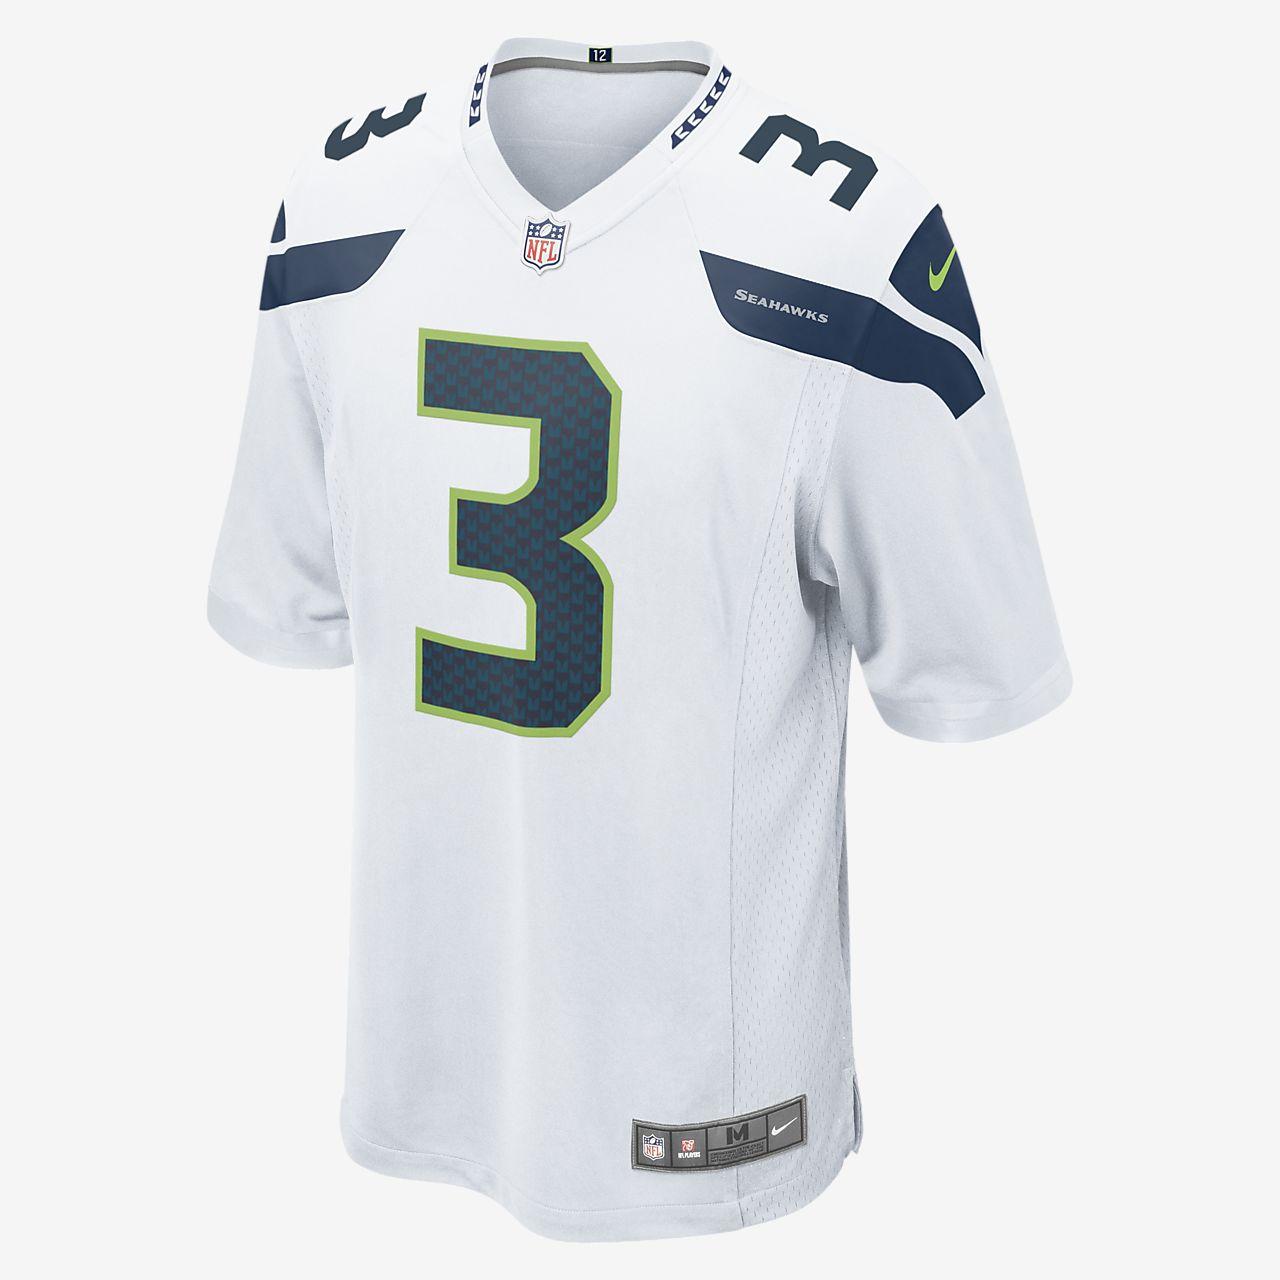 premium selection 3c75e 724be NFL Seattle Seahawks (Russell Wilson) American-Football-Spieltrikot für  Herren